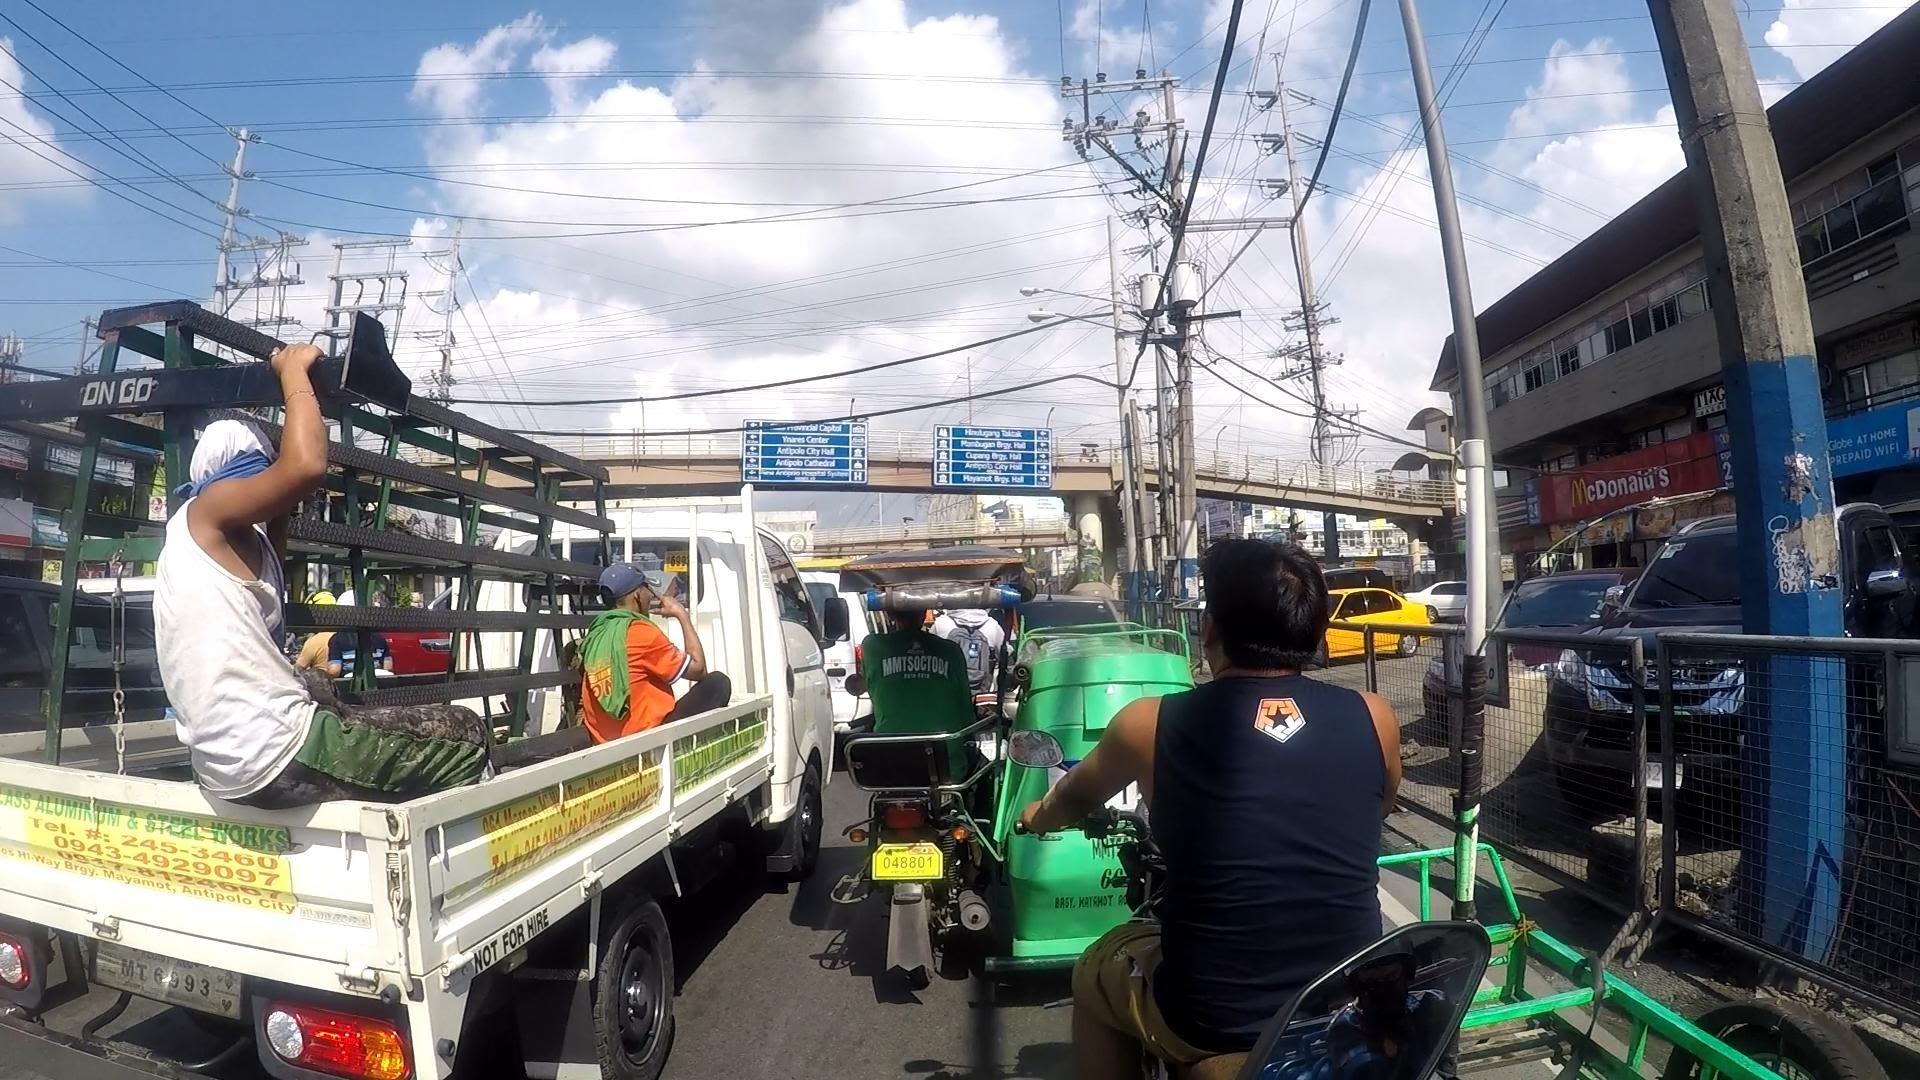 Metro Manila Traffic July 2019